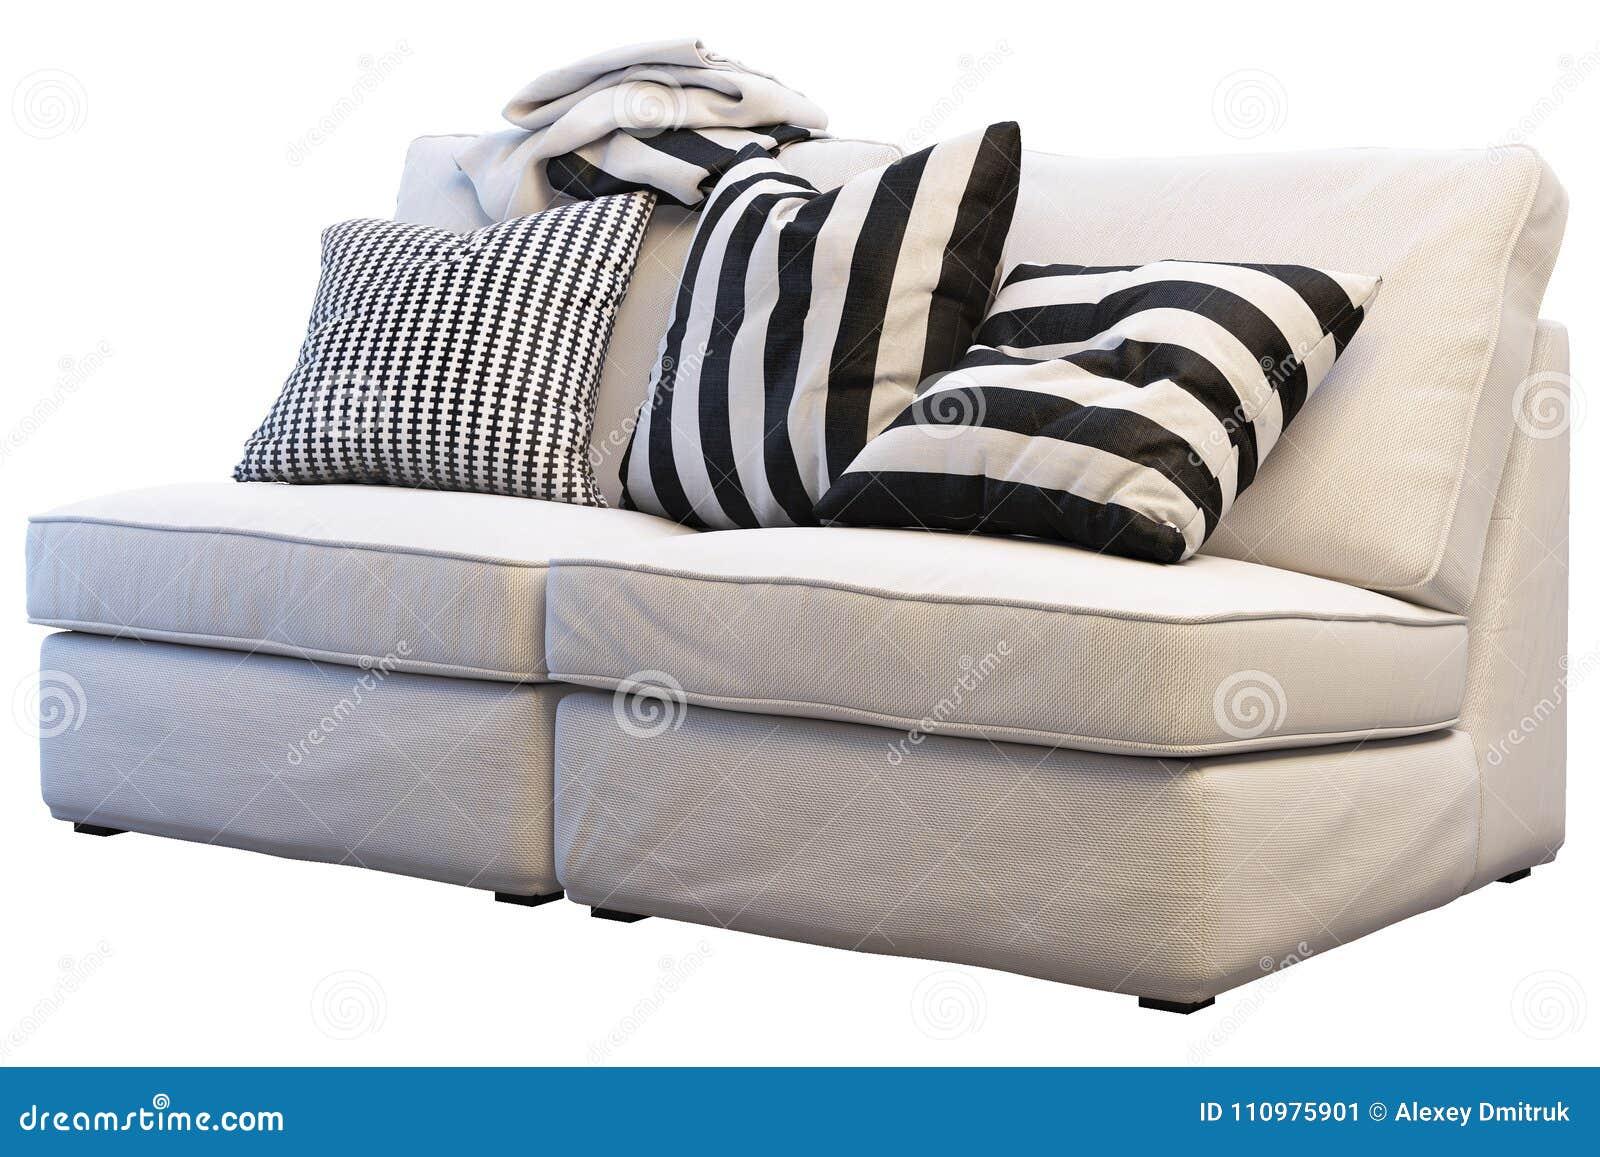 Ikea Kivik Sofa With Plaids And Pillows Stock Image Image Of